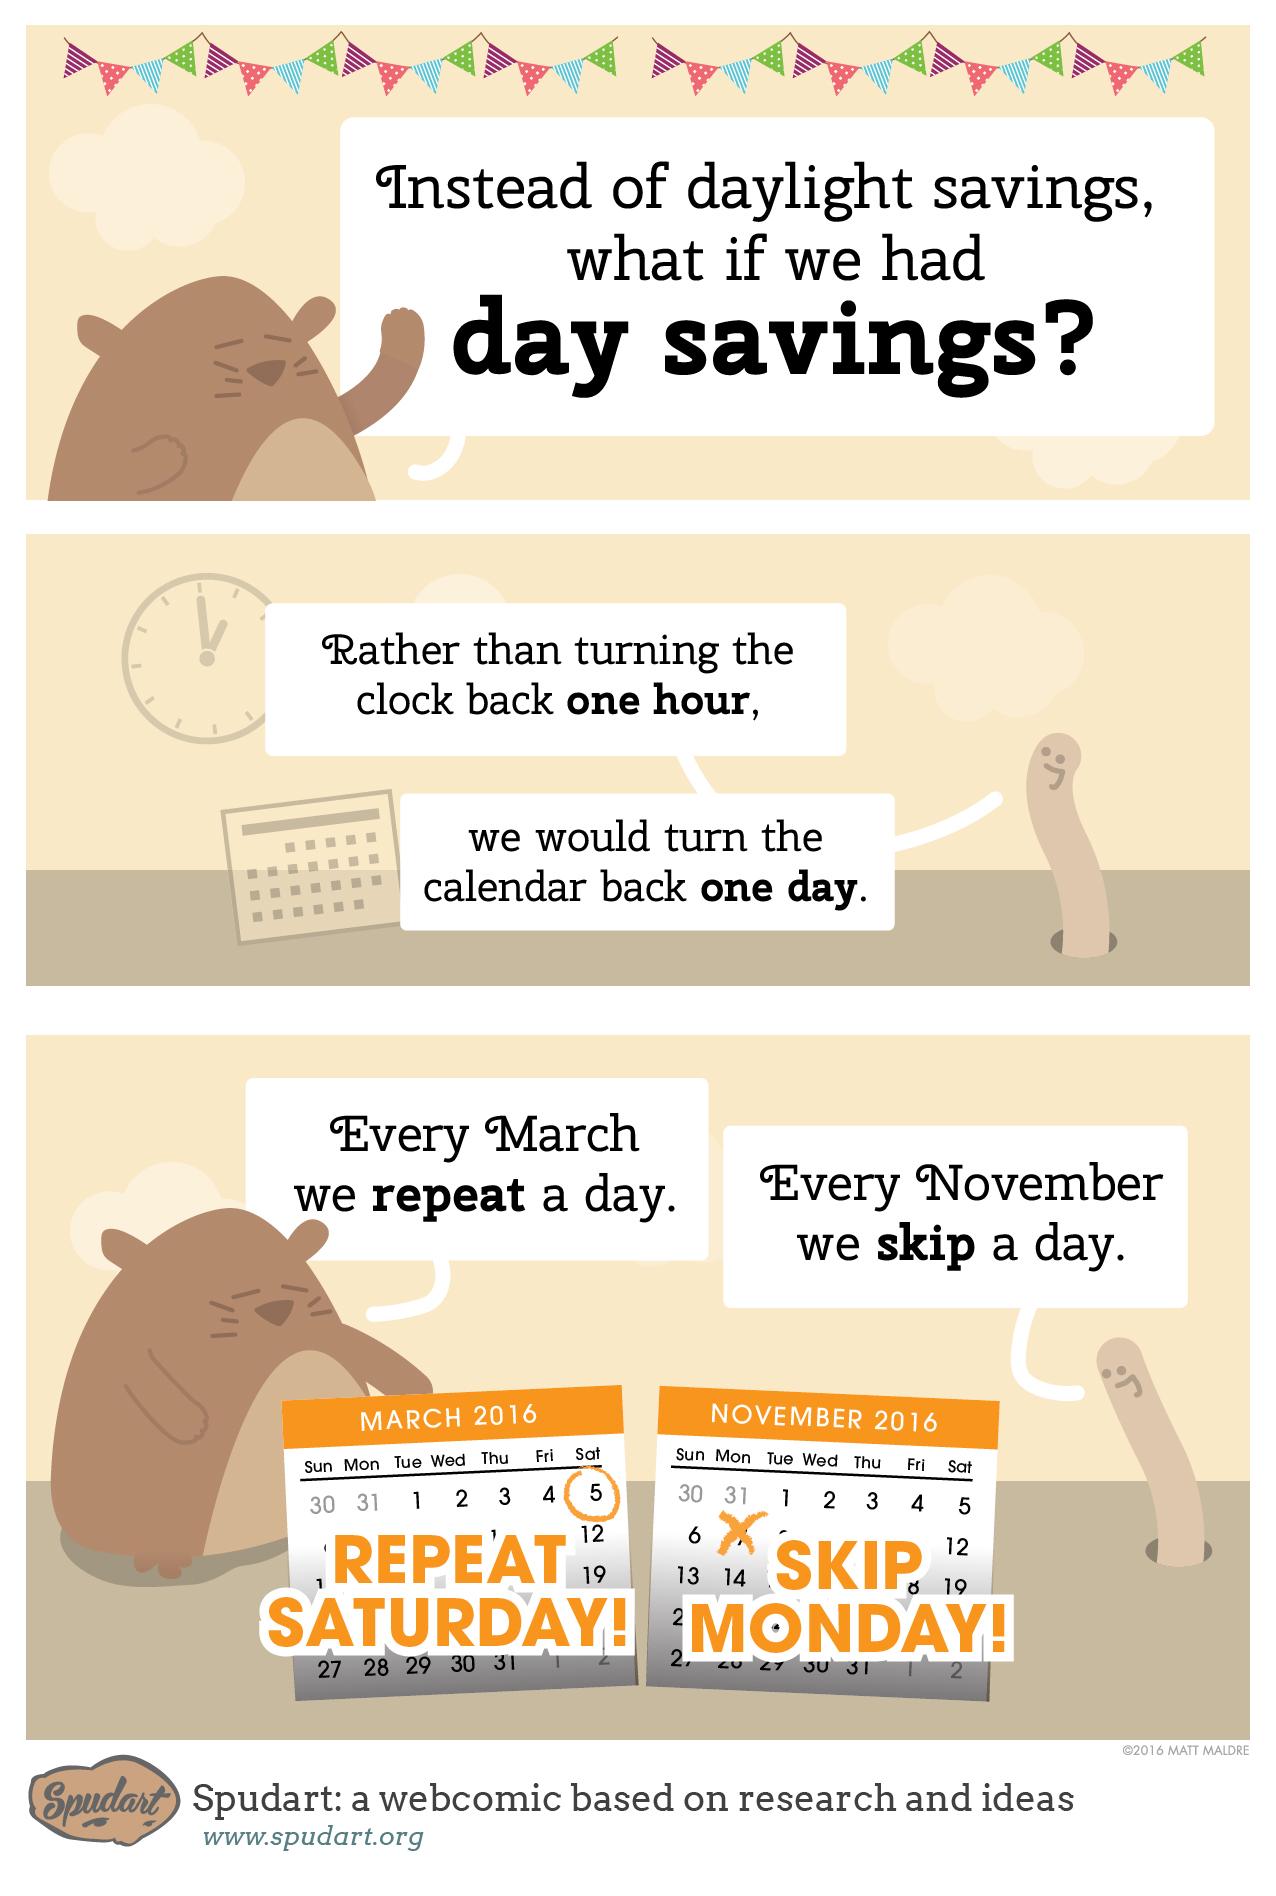 Instead of Daylight Savings, what if we had Day Savings?